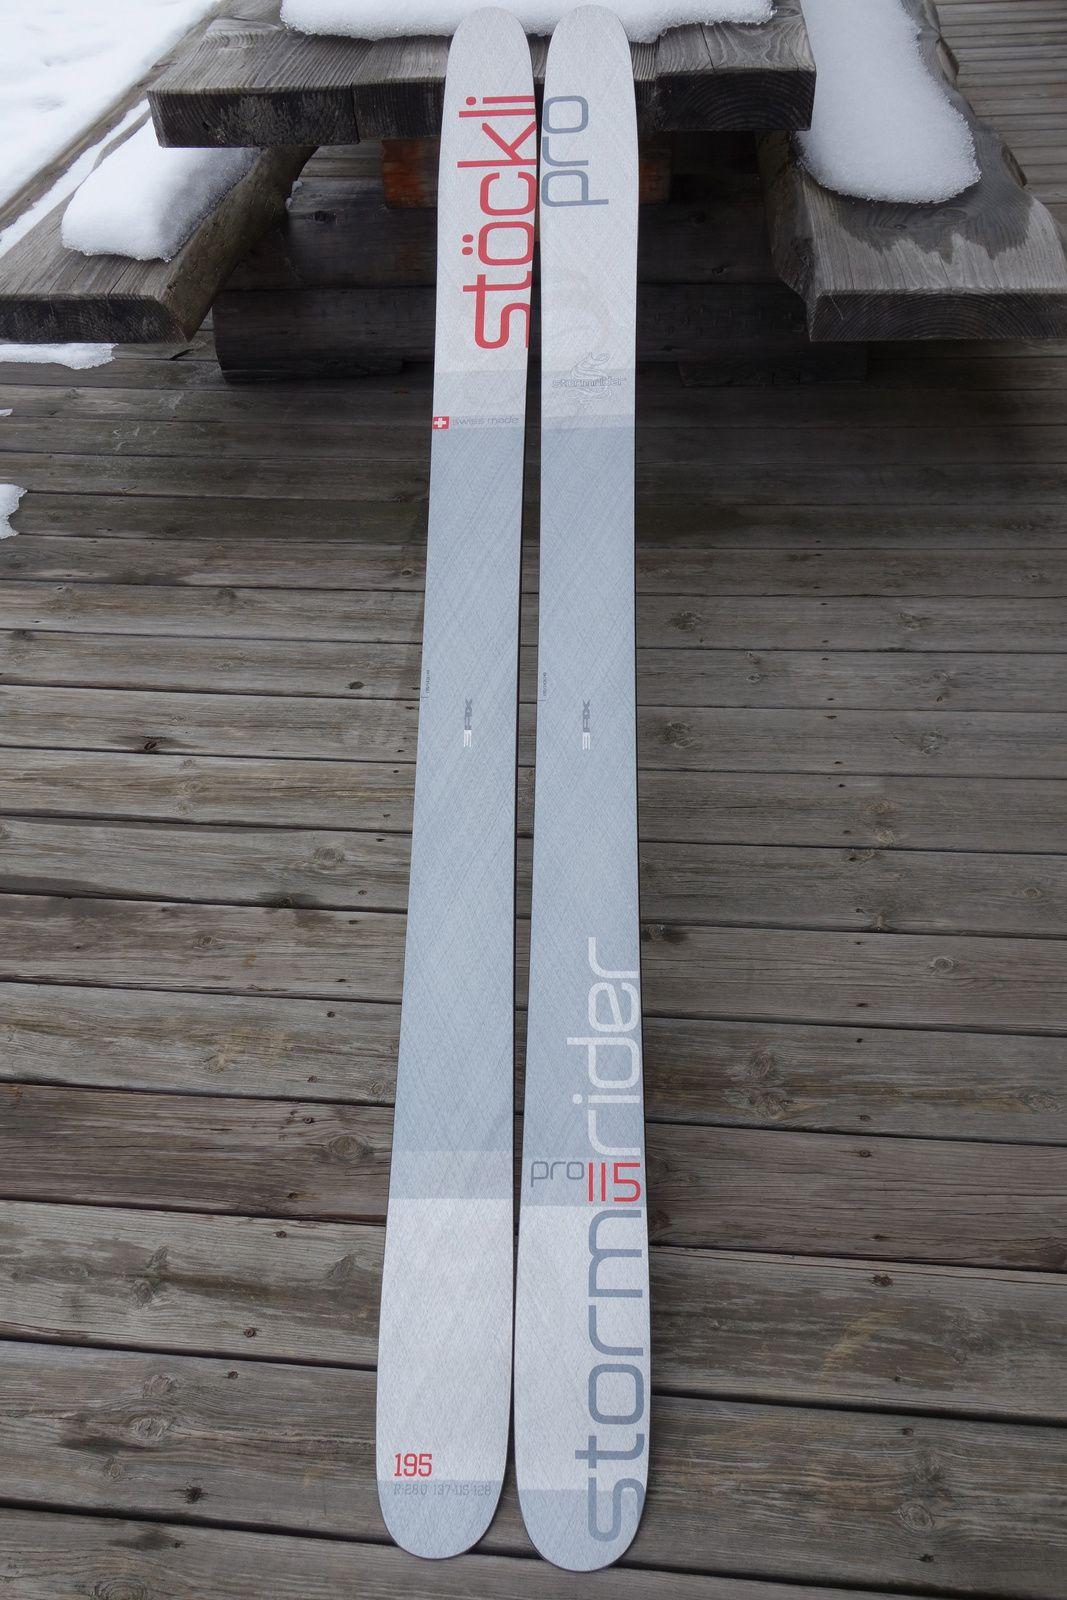 Ski STÖCKLI http://www.geromegualaguidechamonix.com